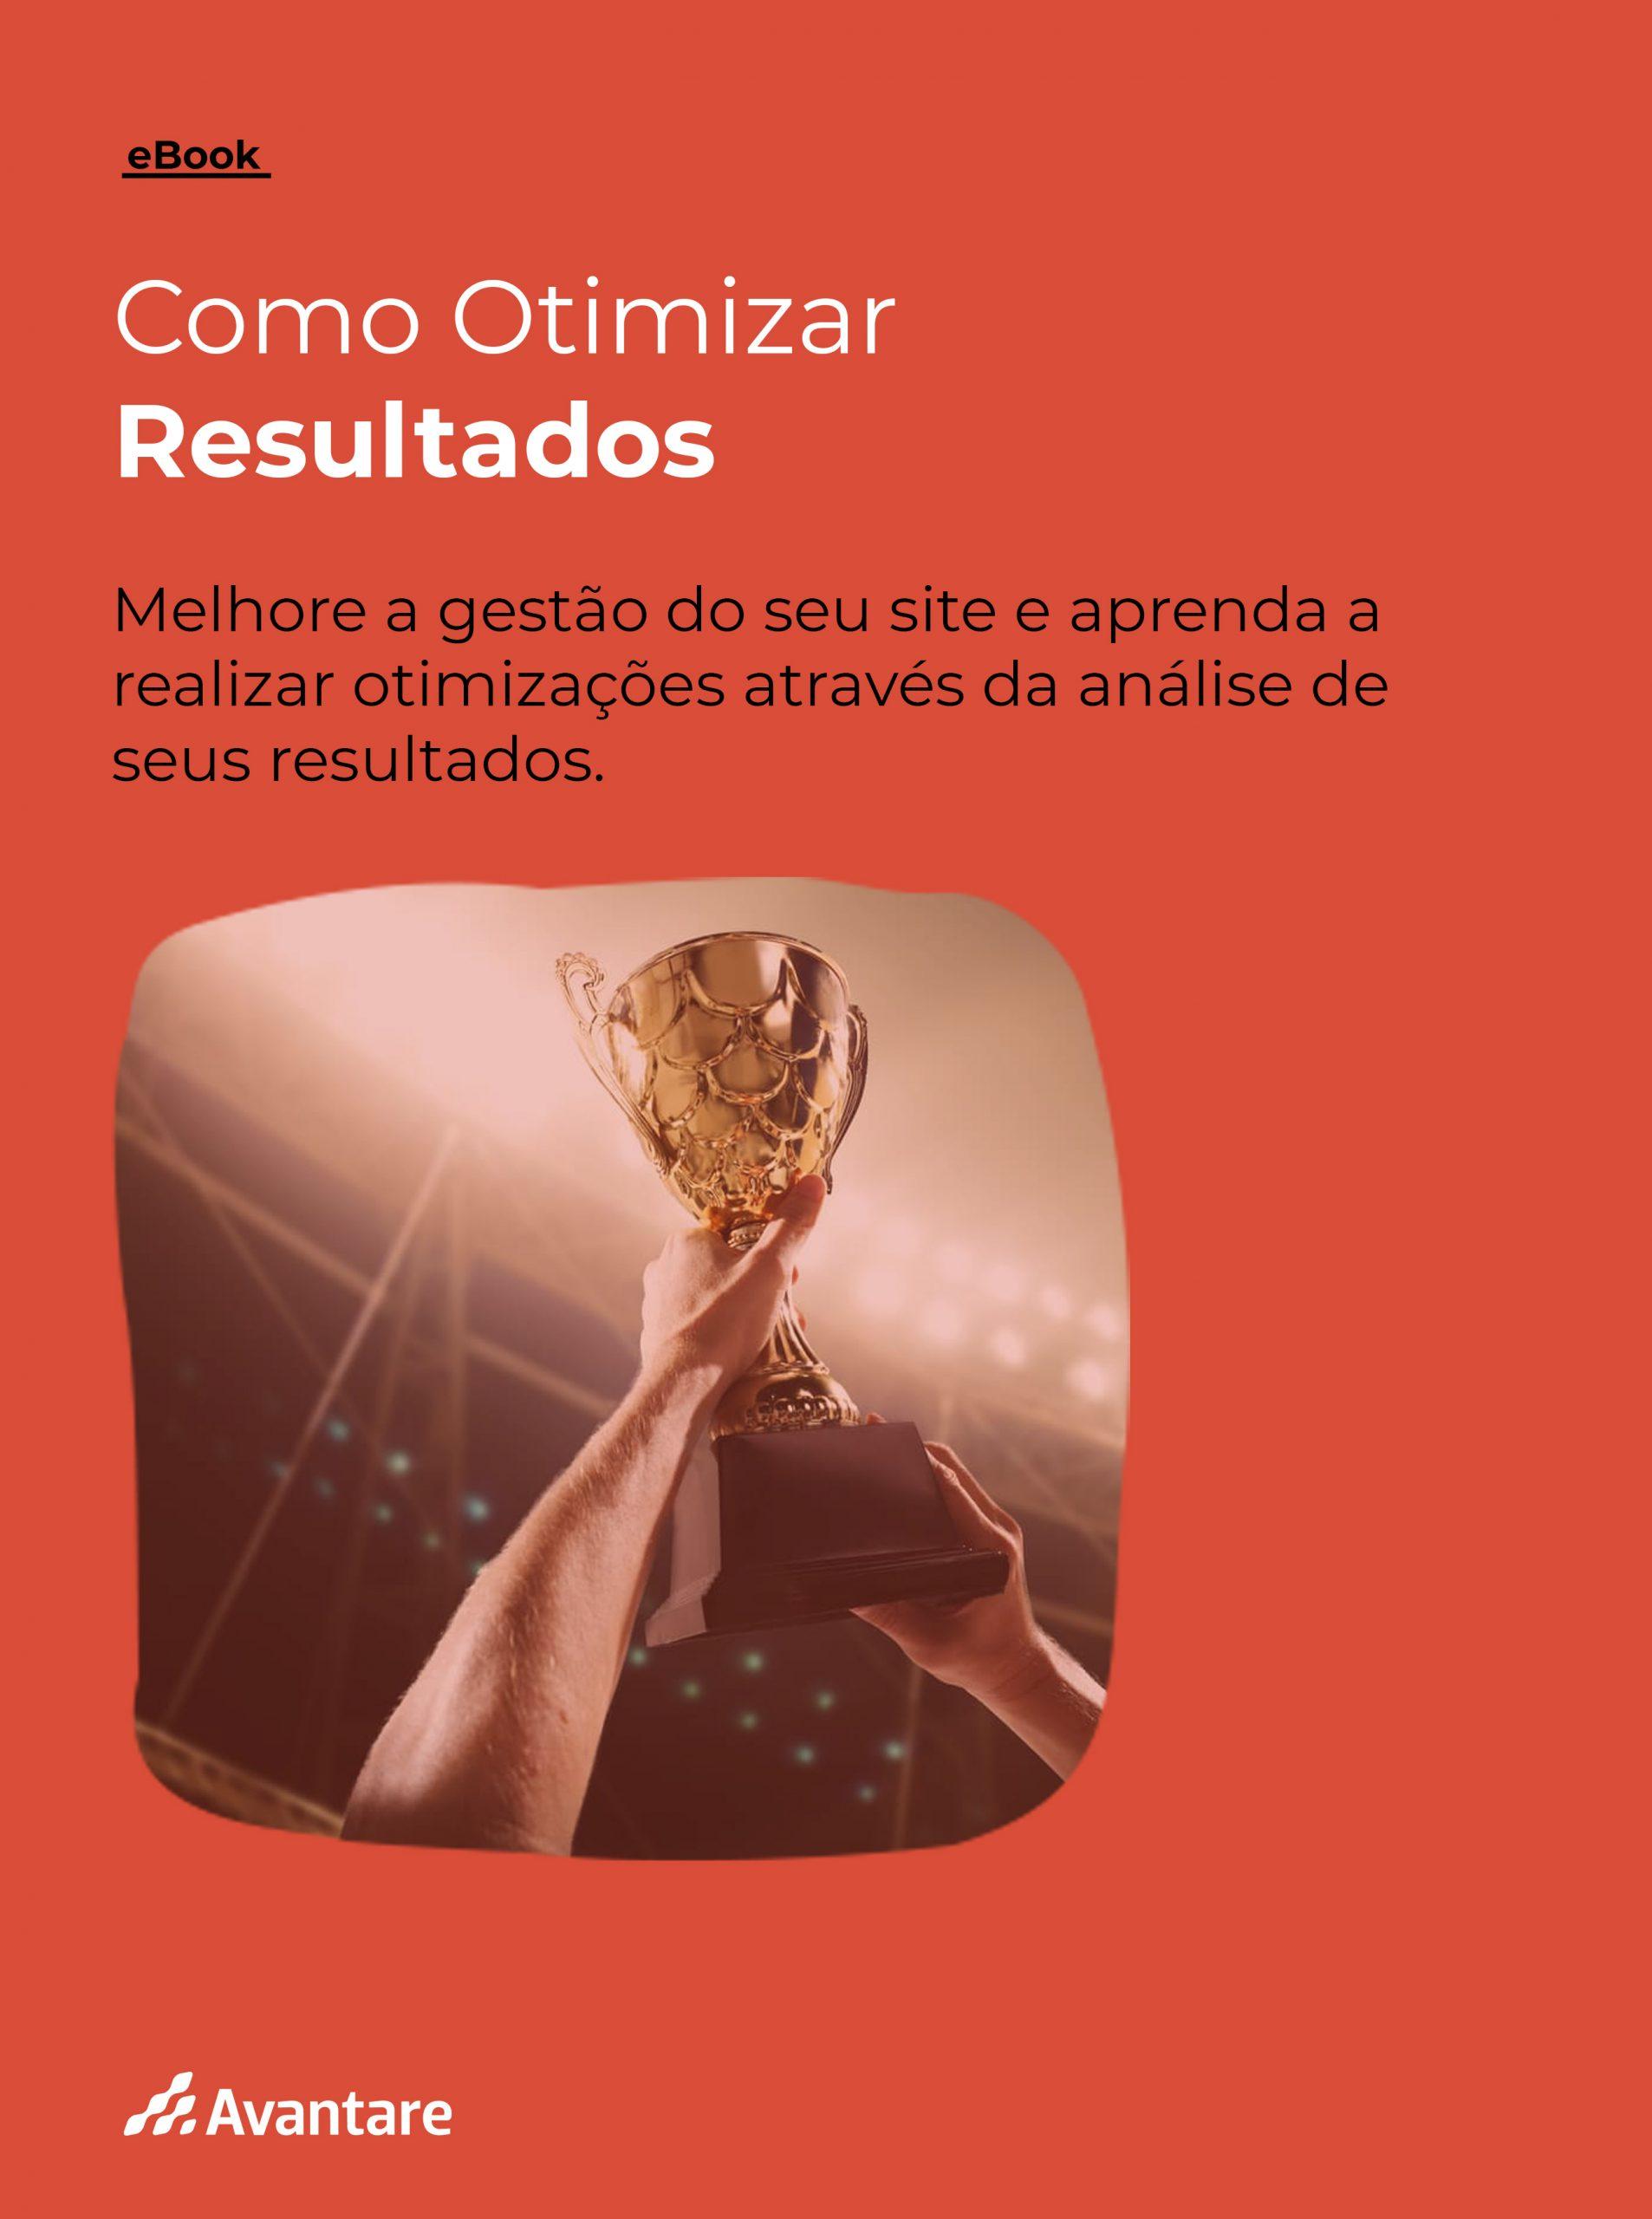 E-book_Como_Otimizar_Resultados